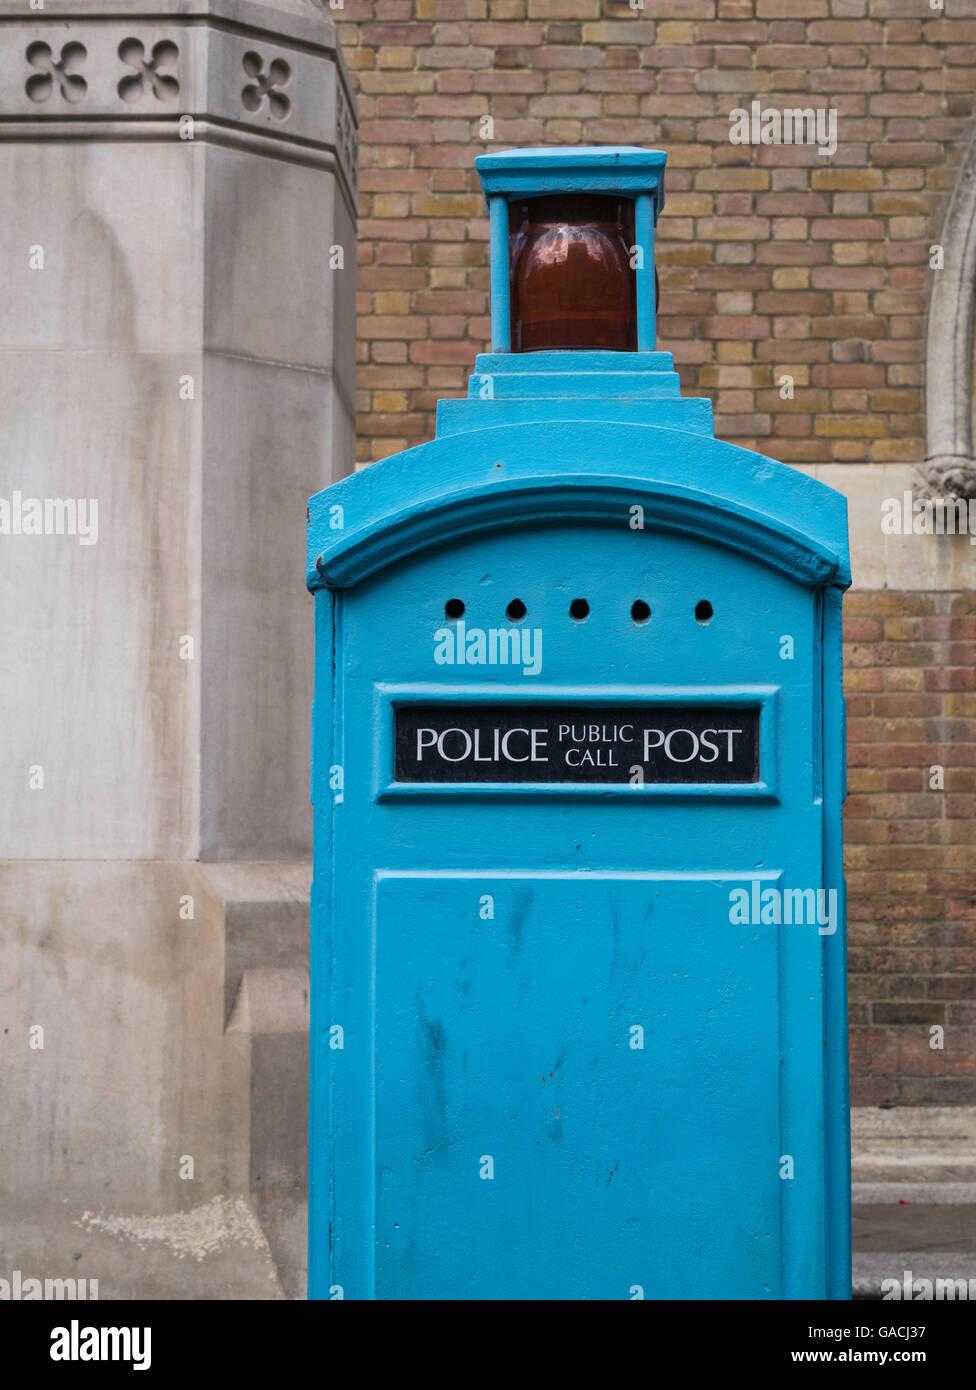 Old blue Police public call box no longer used City of London England UK - Stock Image